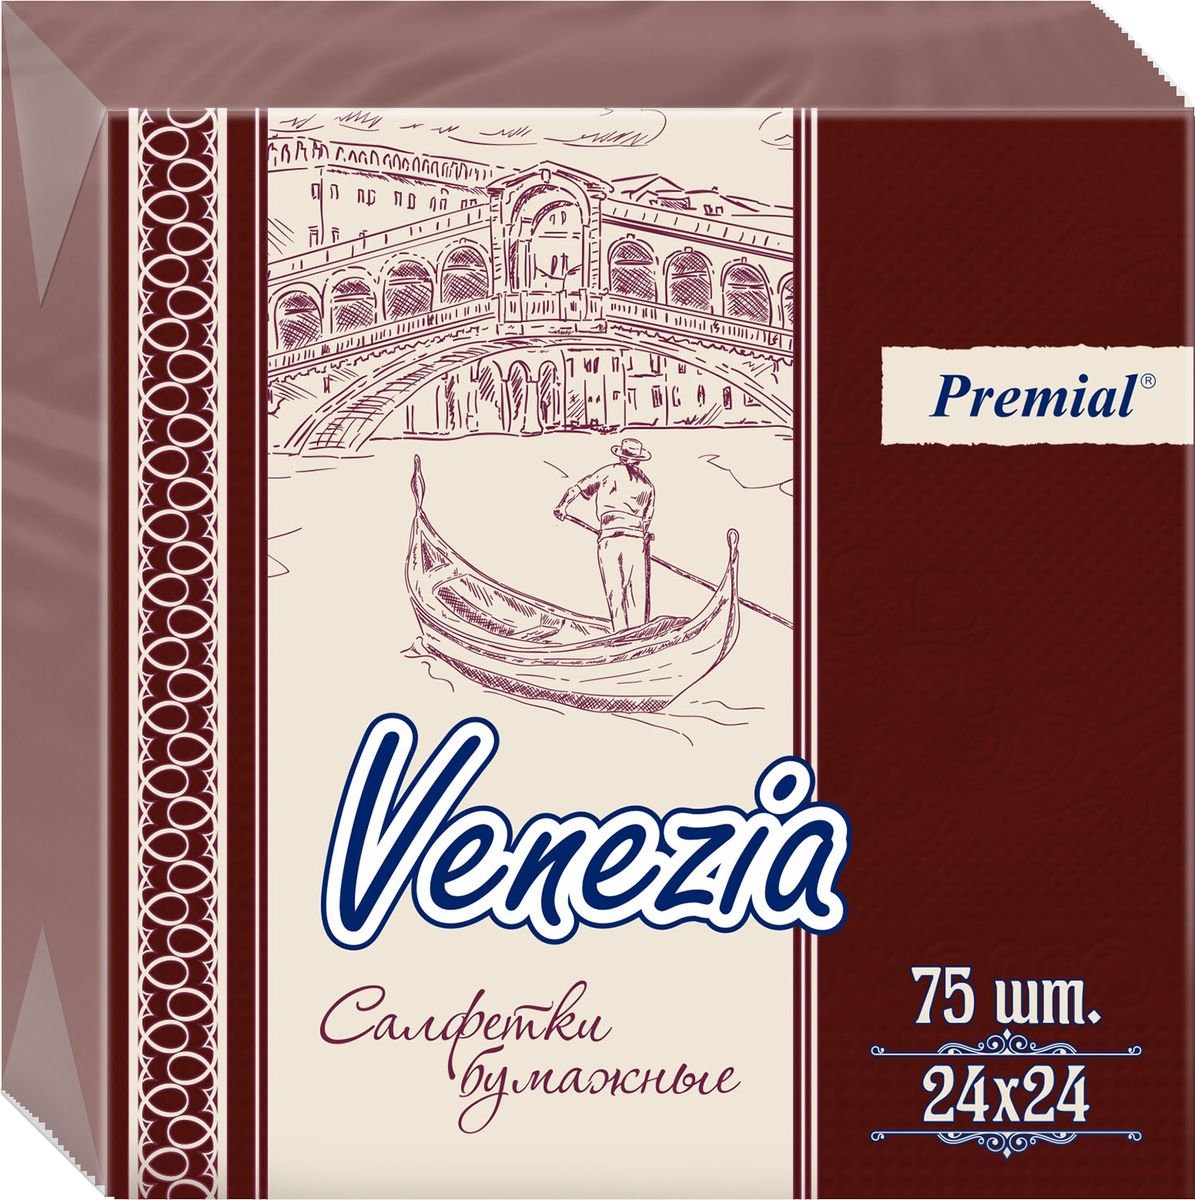 Premial Venezia Салфетки декоративные однослойные цветные, 75 шт